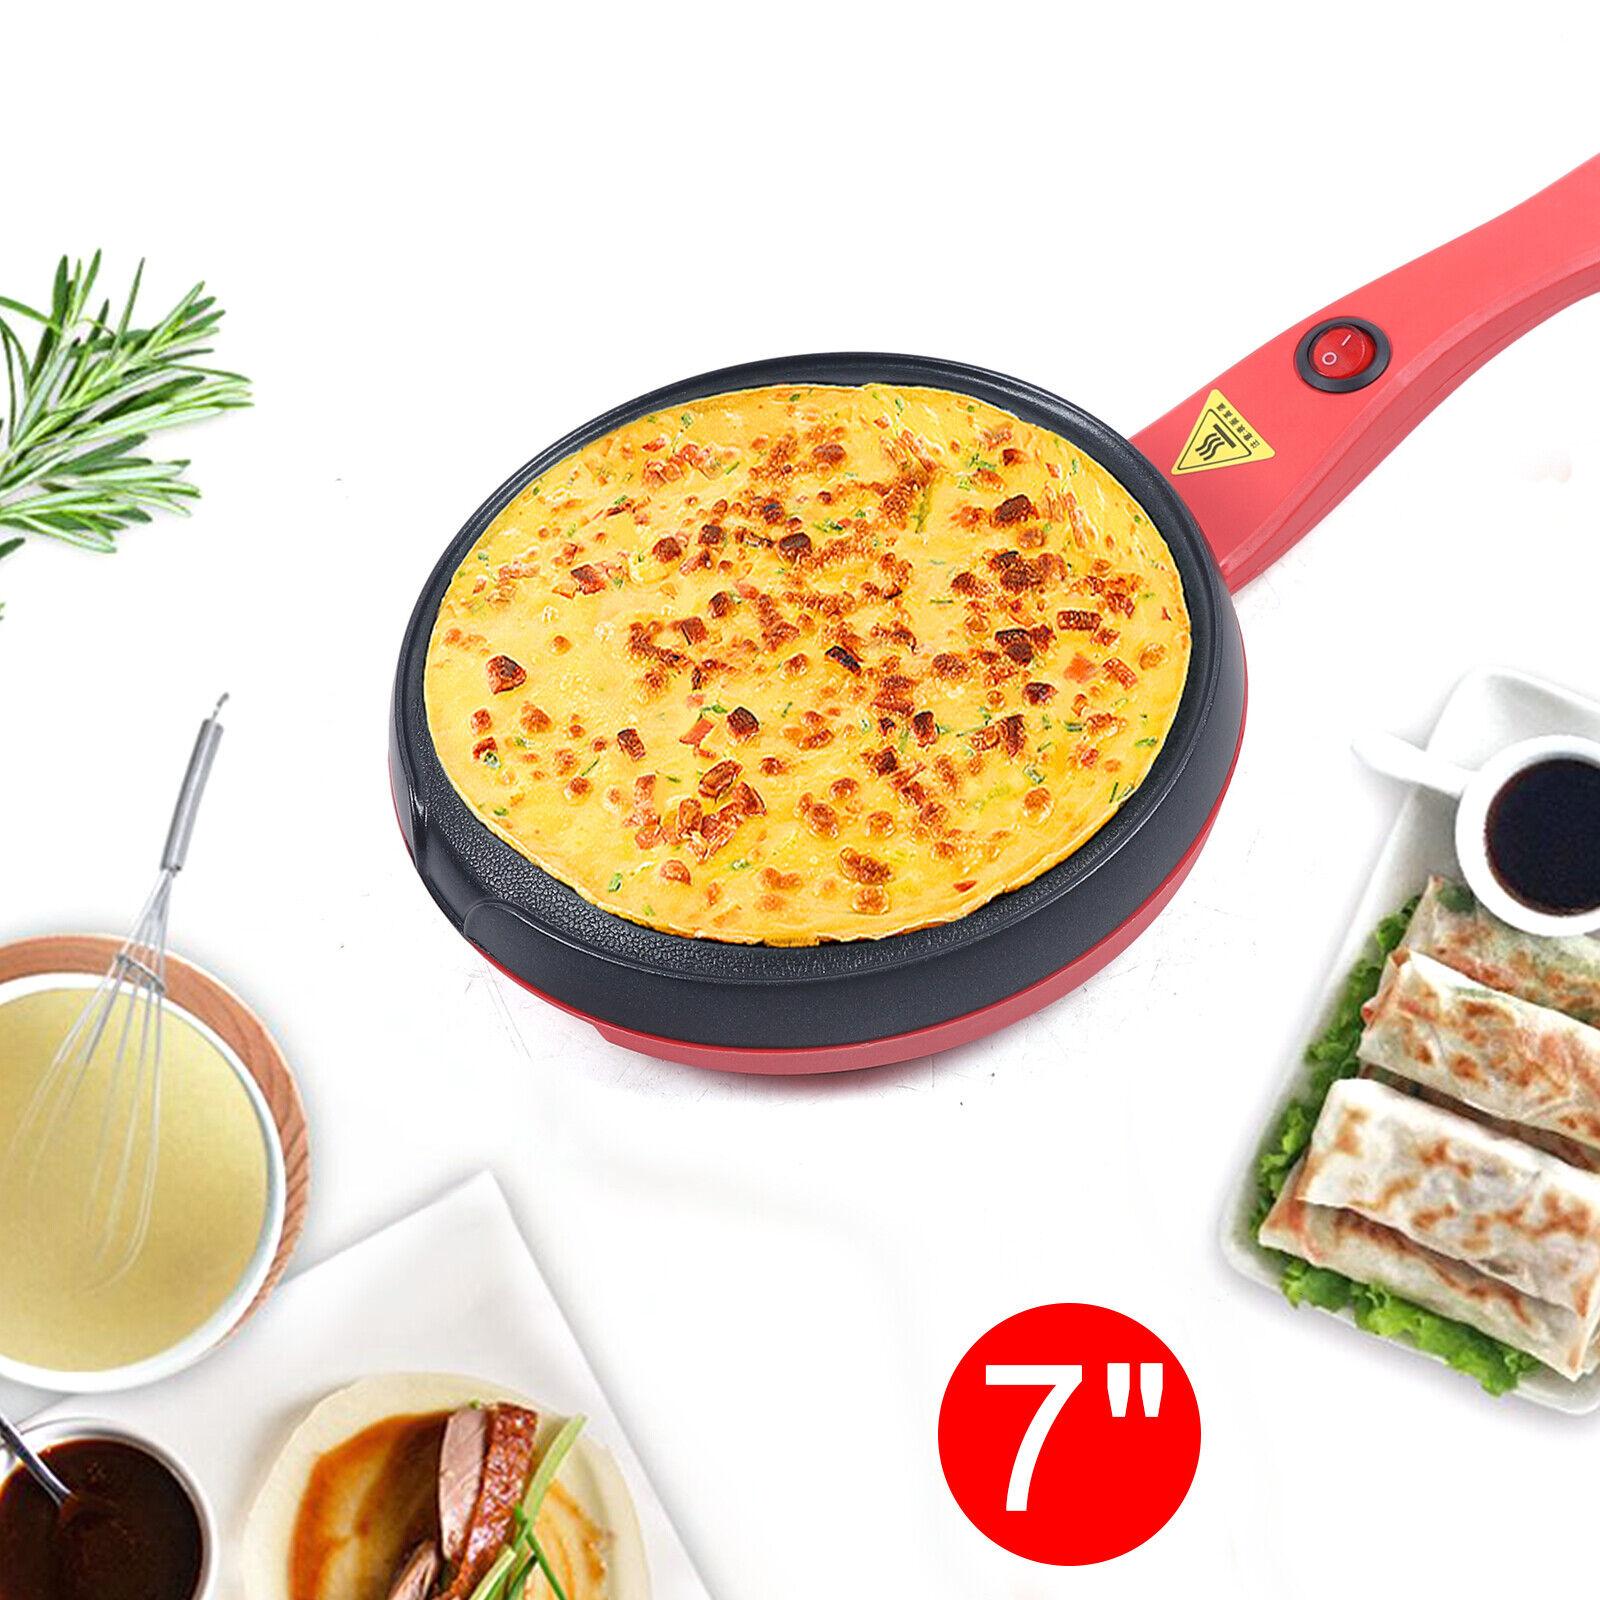 7 inch Electric Crepe Maker Non-Stick Pancake Baking Pan Fry